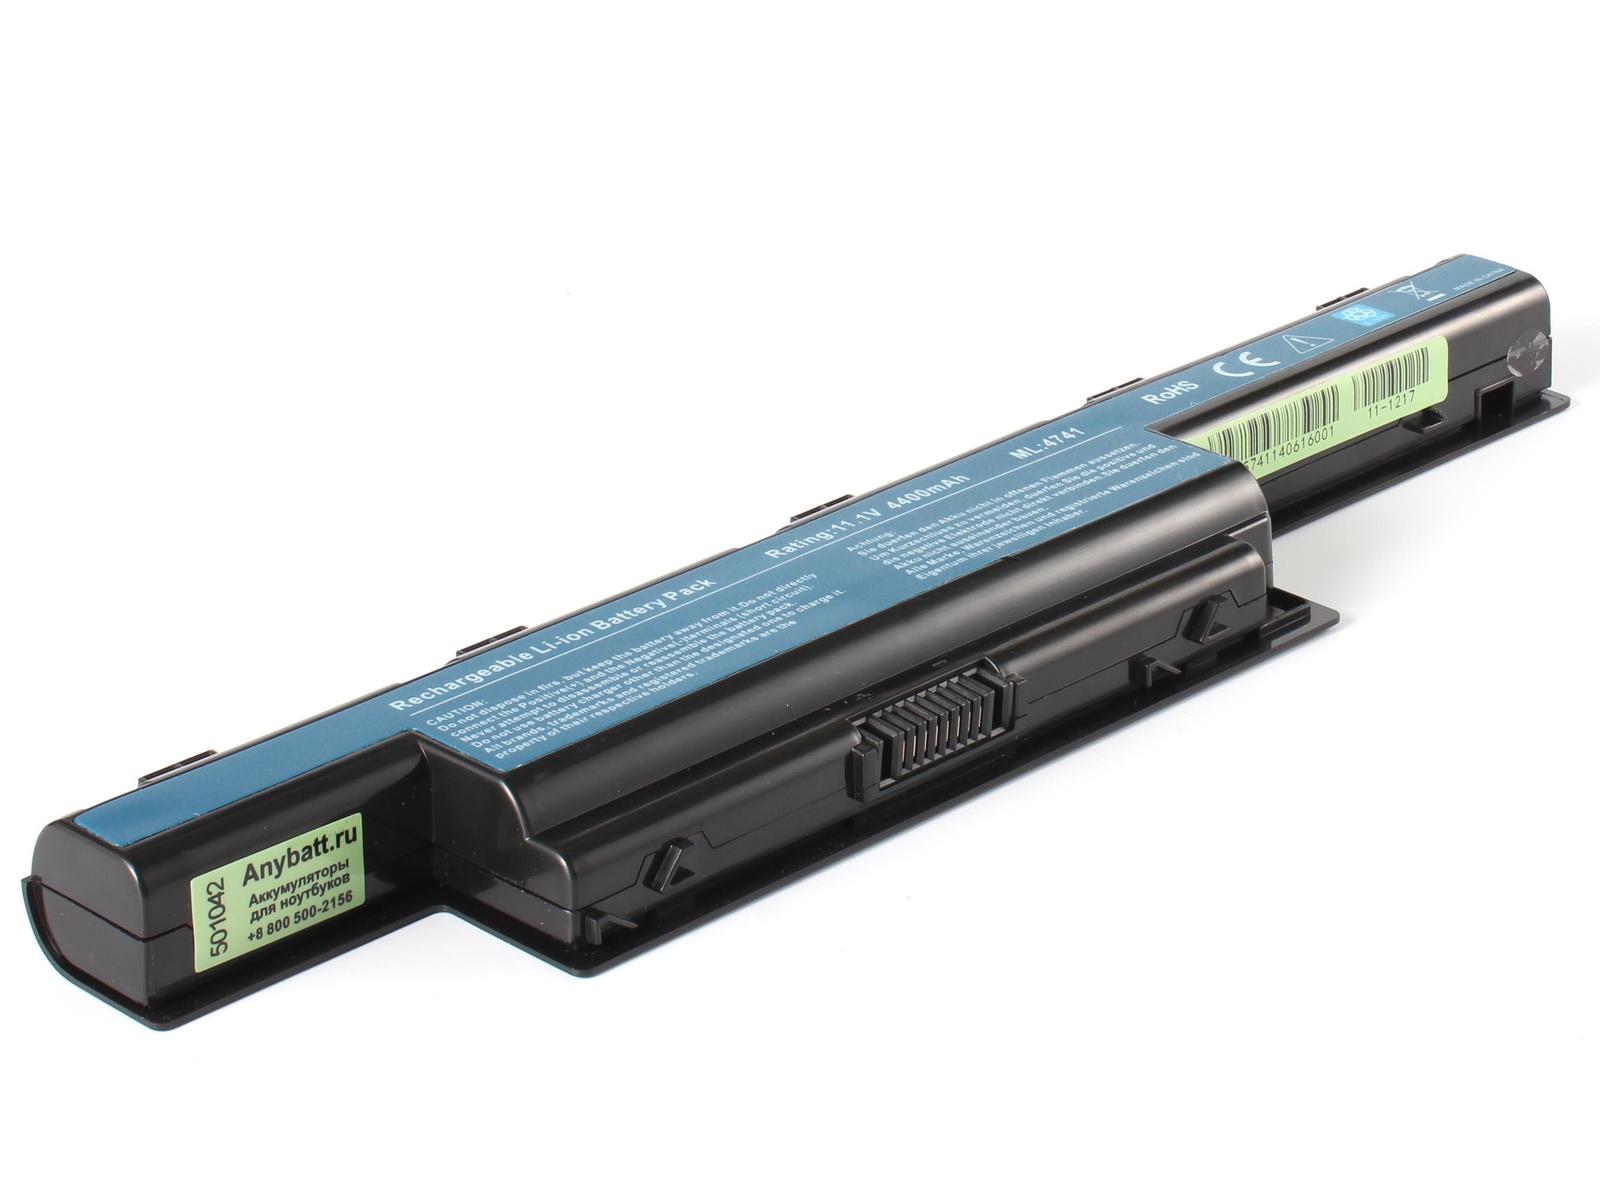 Аккумулятор для ноутбука AnyBatt для Acer Aspire 5552G-N934G32Mikk, Aspire 5733Z-P623G32Mikk, Aspire 4738, Aspire E1-772G-34004G50Mnsk, Travelmate P273-MG-20204G50Mnks, Aspire 5250-E302G32Mikk, TravelMate 5542G